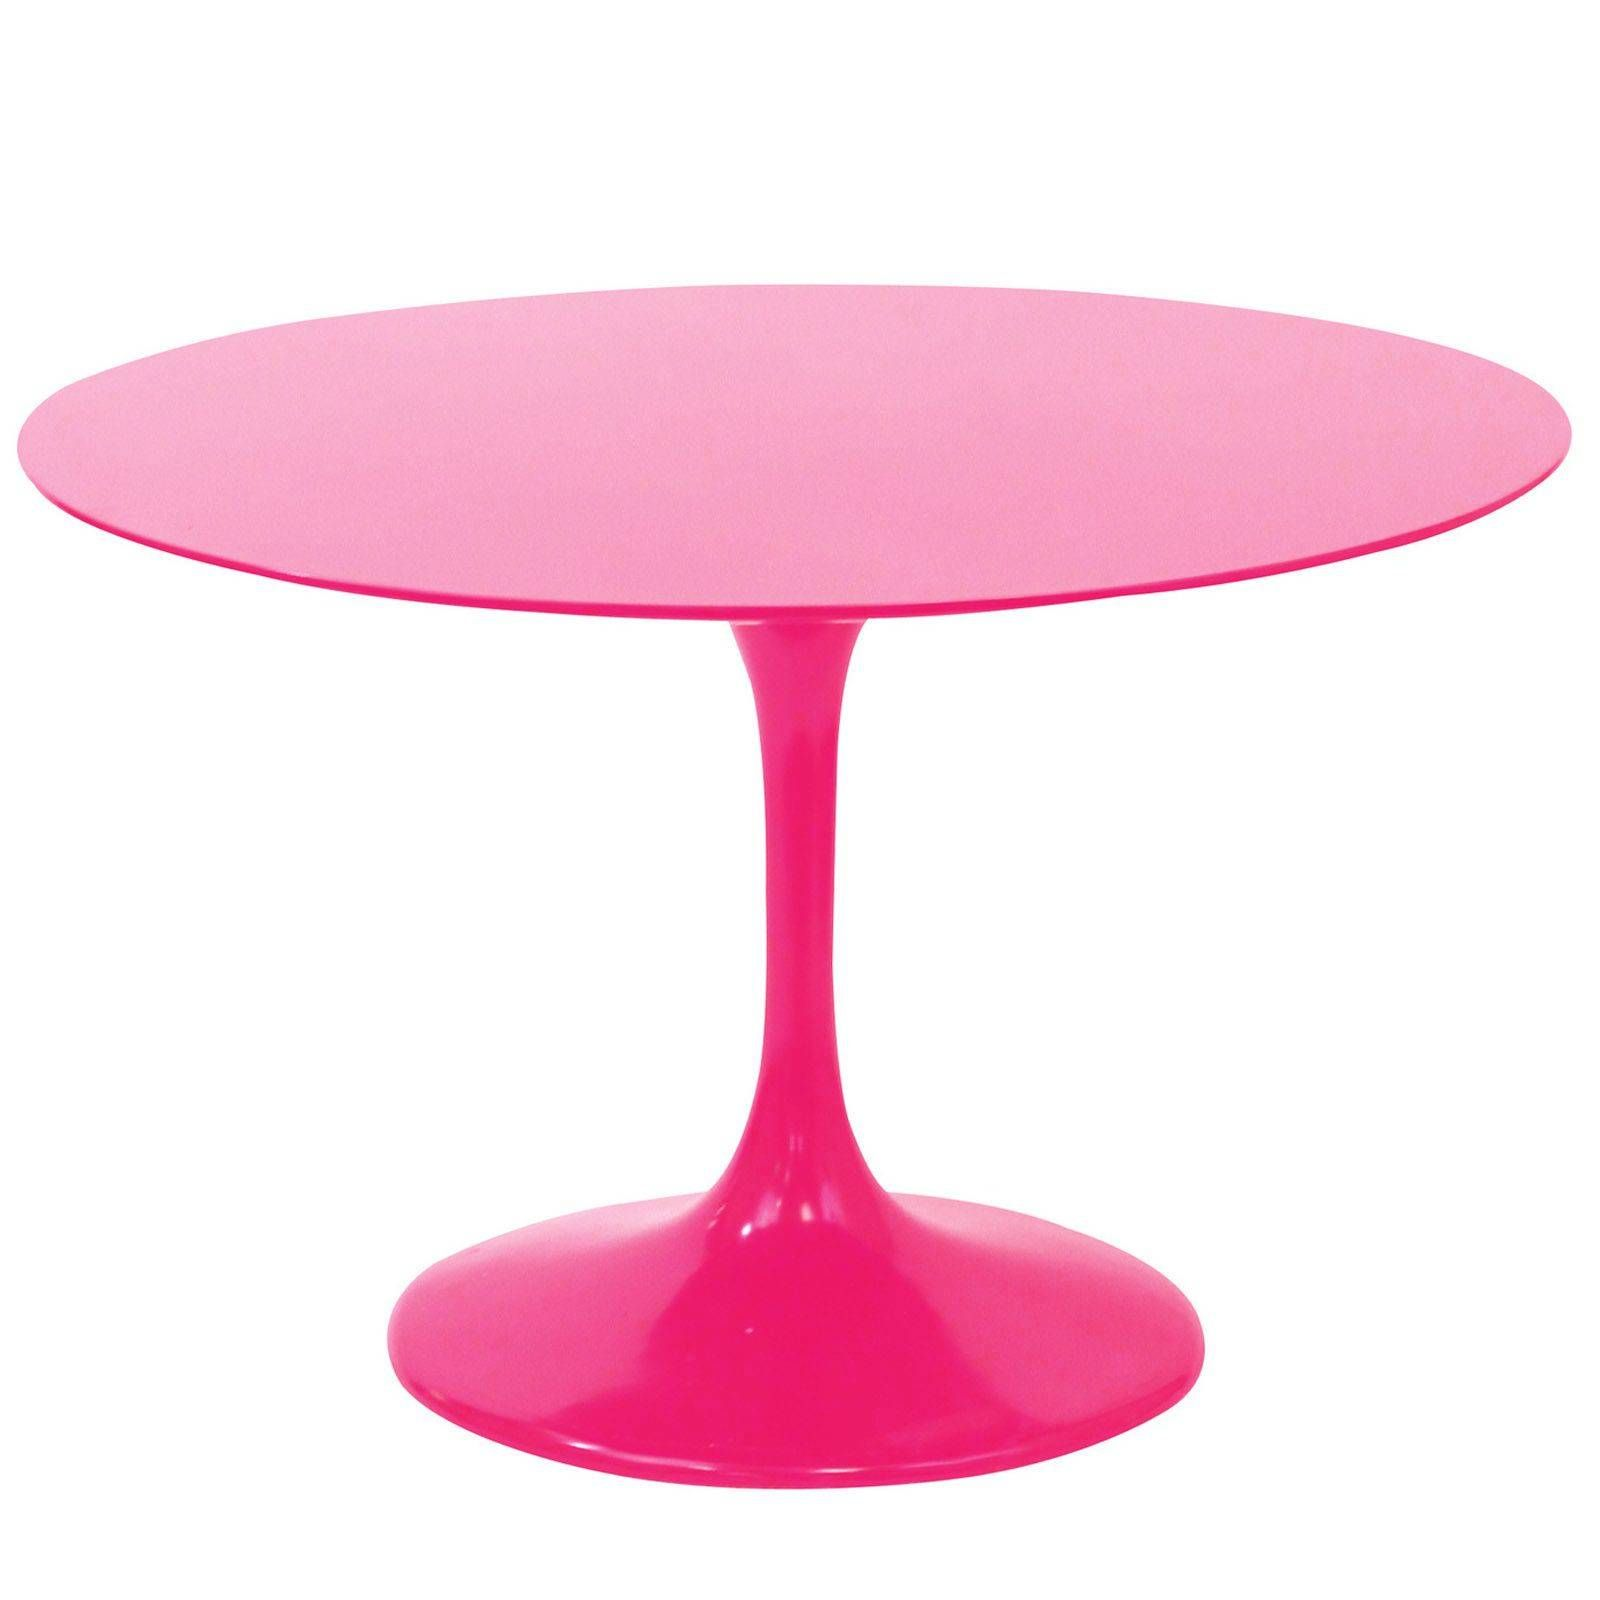 Table Saarinen Buildingdesign Homedesign Architecture Home Design Housedesignidea Private Saarinen Tulip Coffee Table Tulip Coffee Table Coffee Table [ 1600 x 1600 Pixel ]